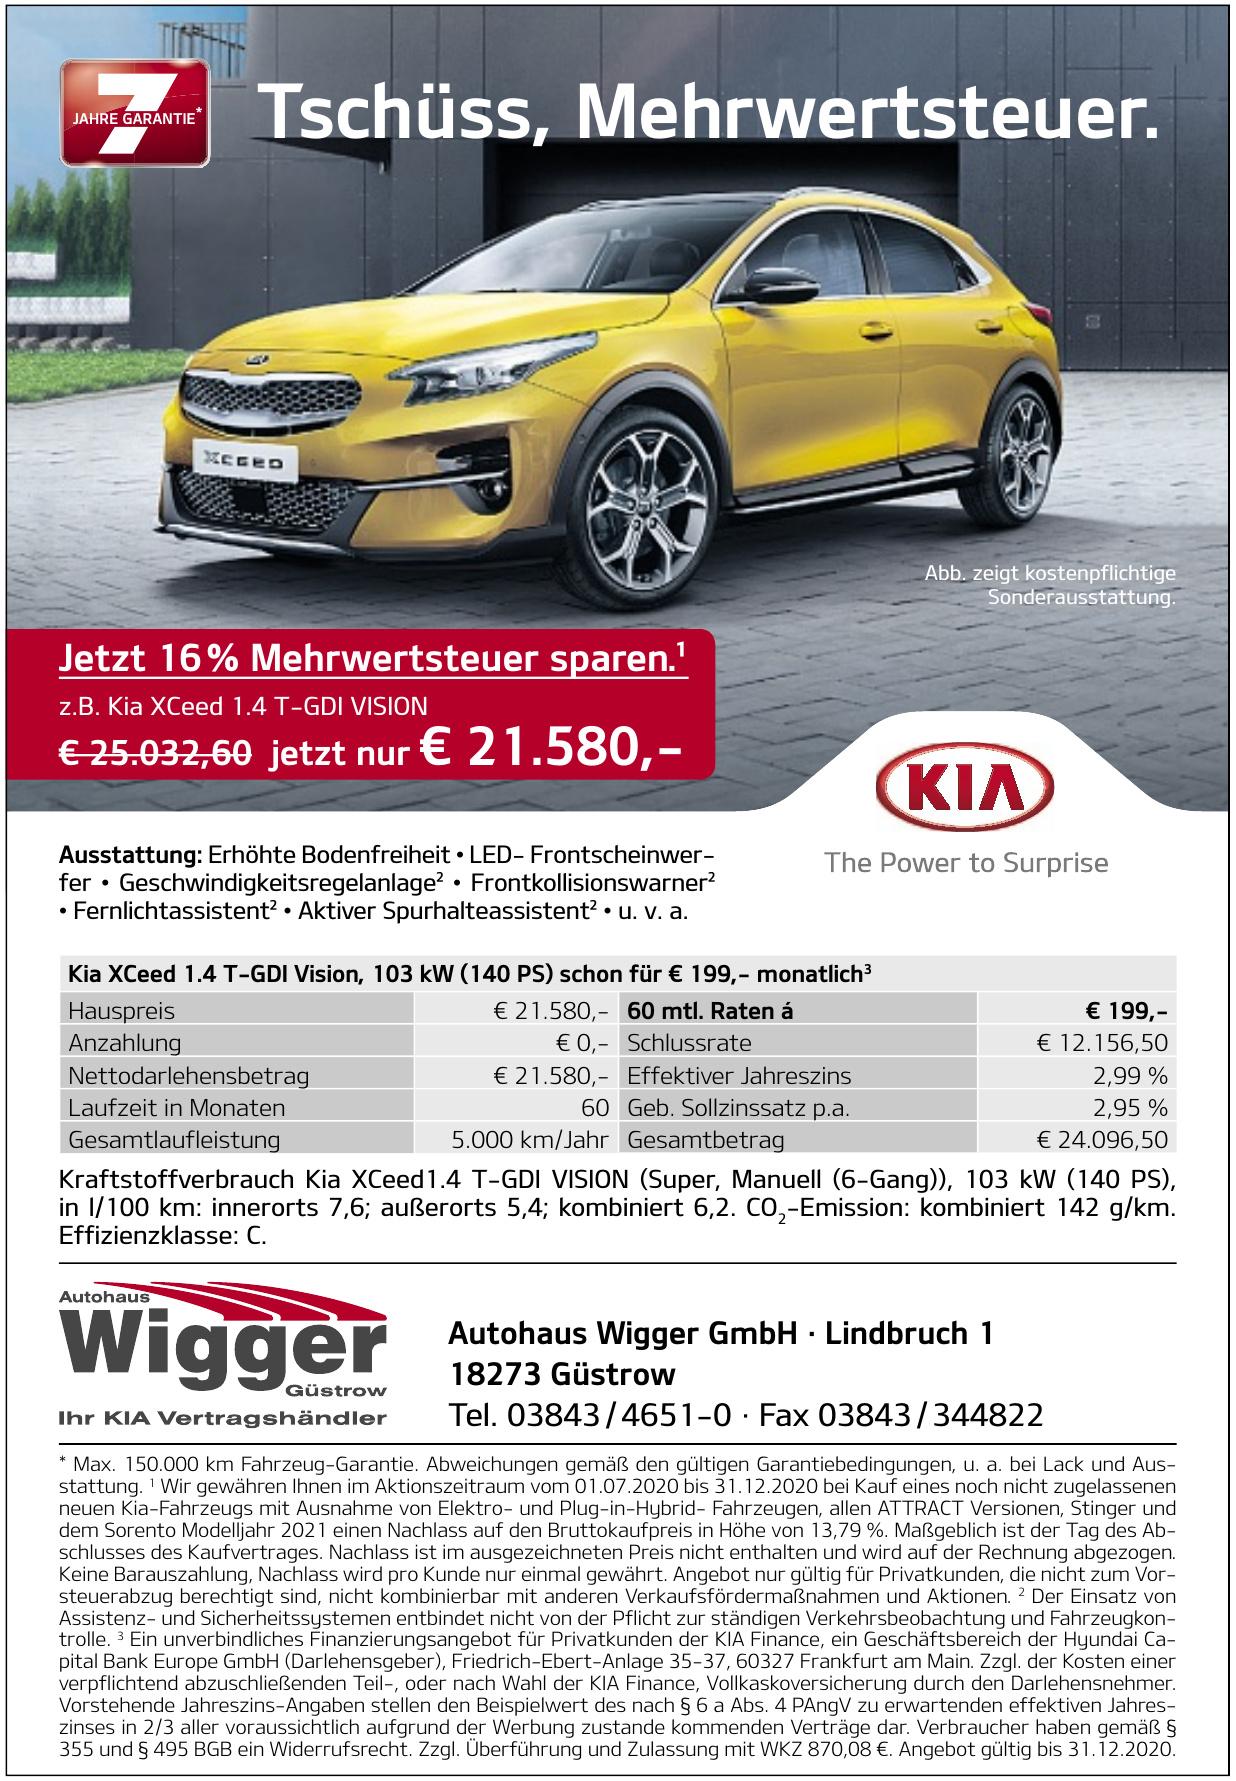 Autohaus Wigger GmbH